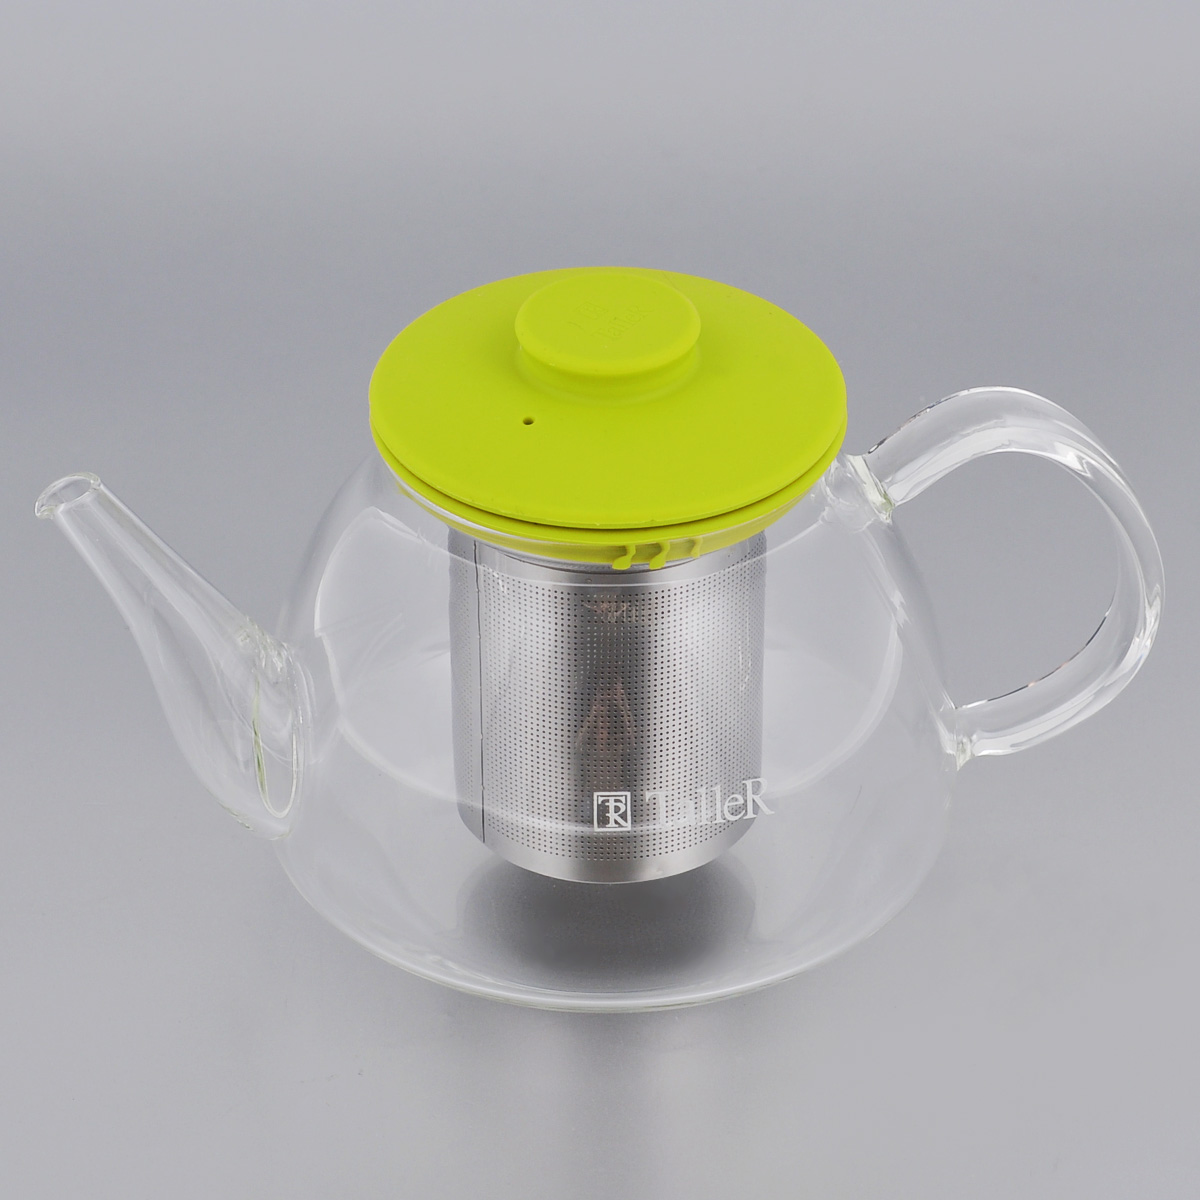 Чайник заварочный Taller Winfred, цвет: салатовый, 0,8 л чайник заварочный taller tr 1346